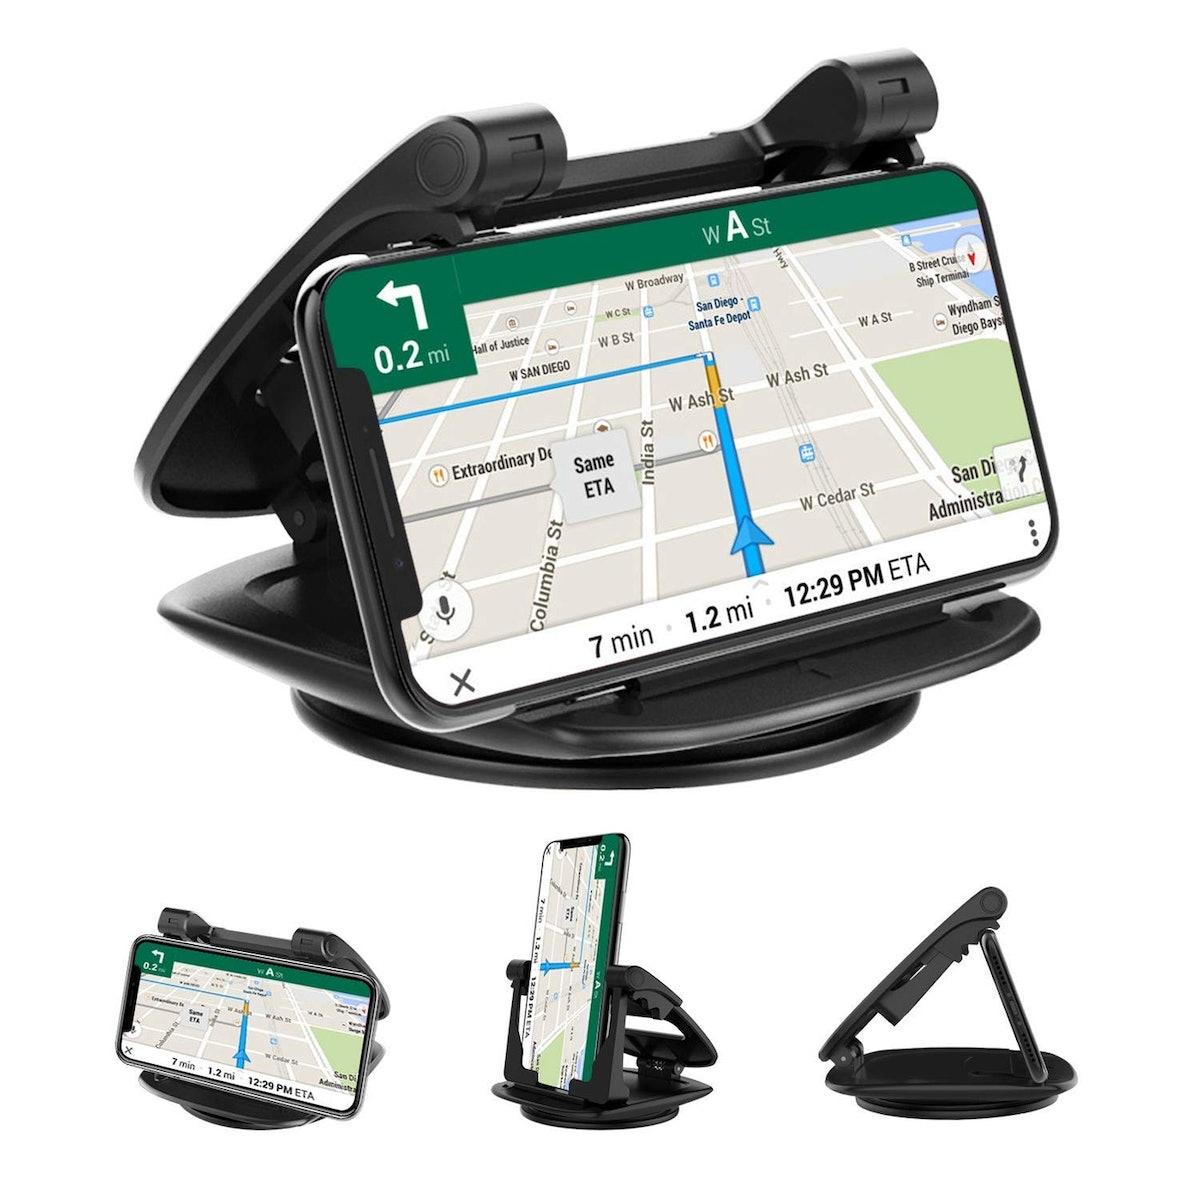 ivoler Cell Phone Holder For Car Dashboard